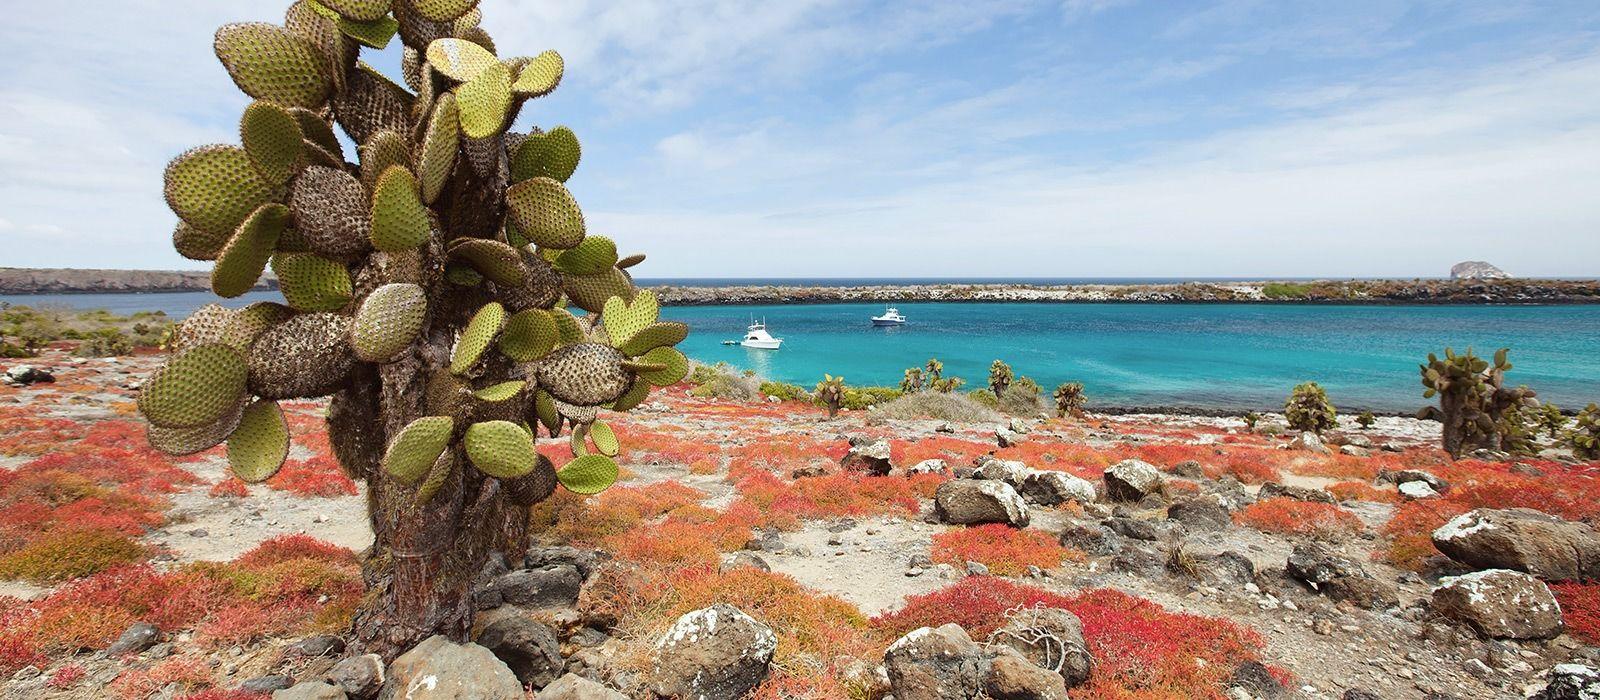 Reiseziel Santa Cruz Ecuador/Galapagos